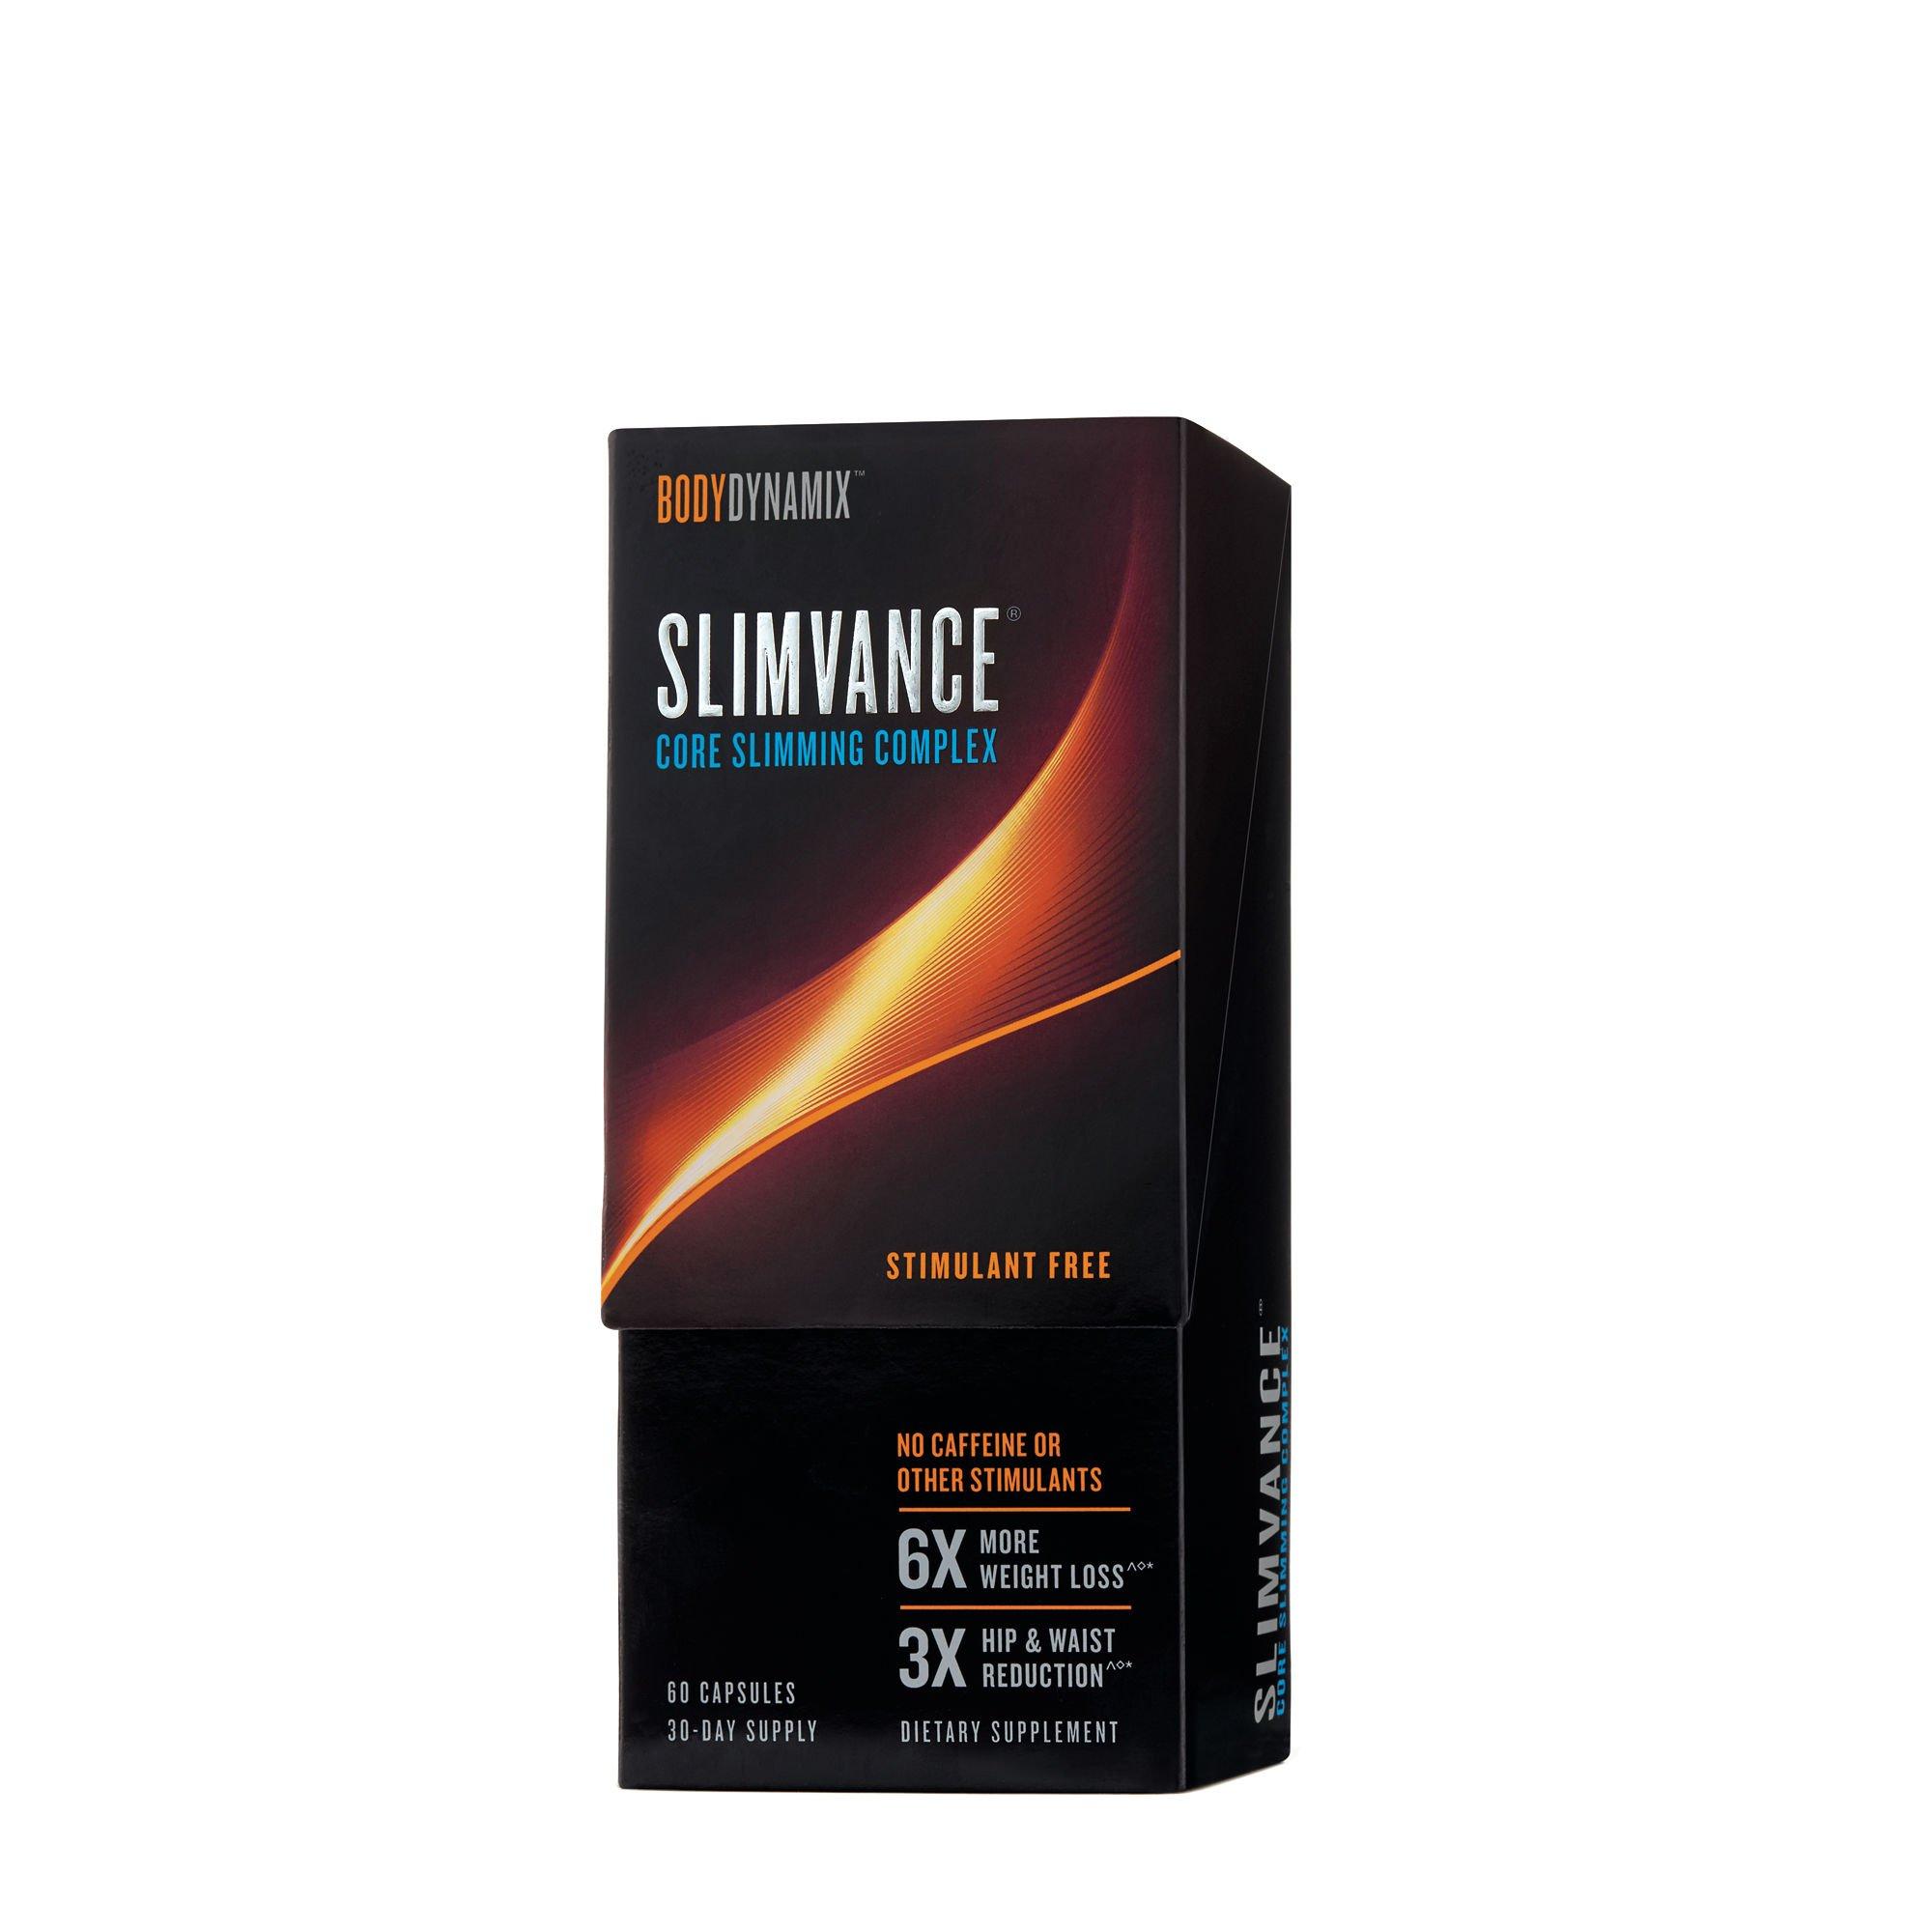 BodyDynamix Slimvance Core Slimming Complex Stimulant Free